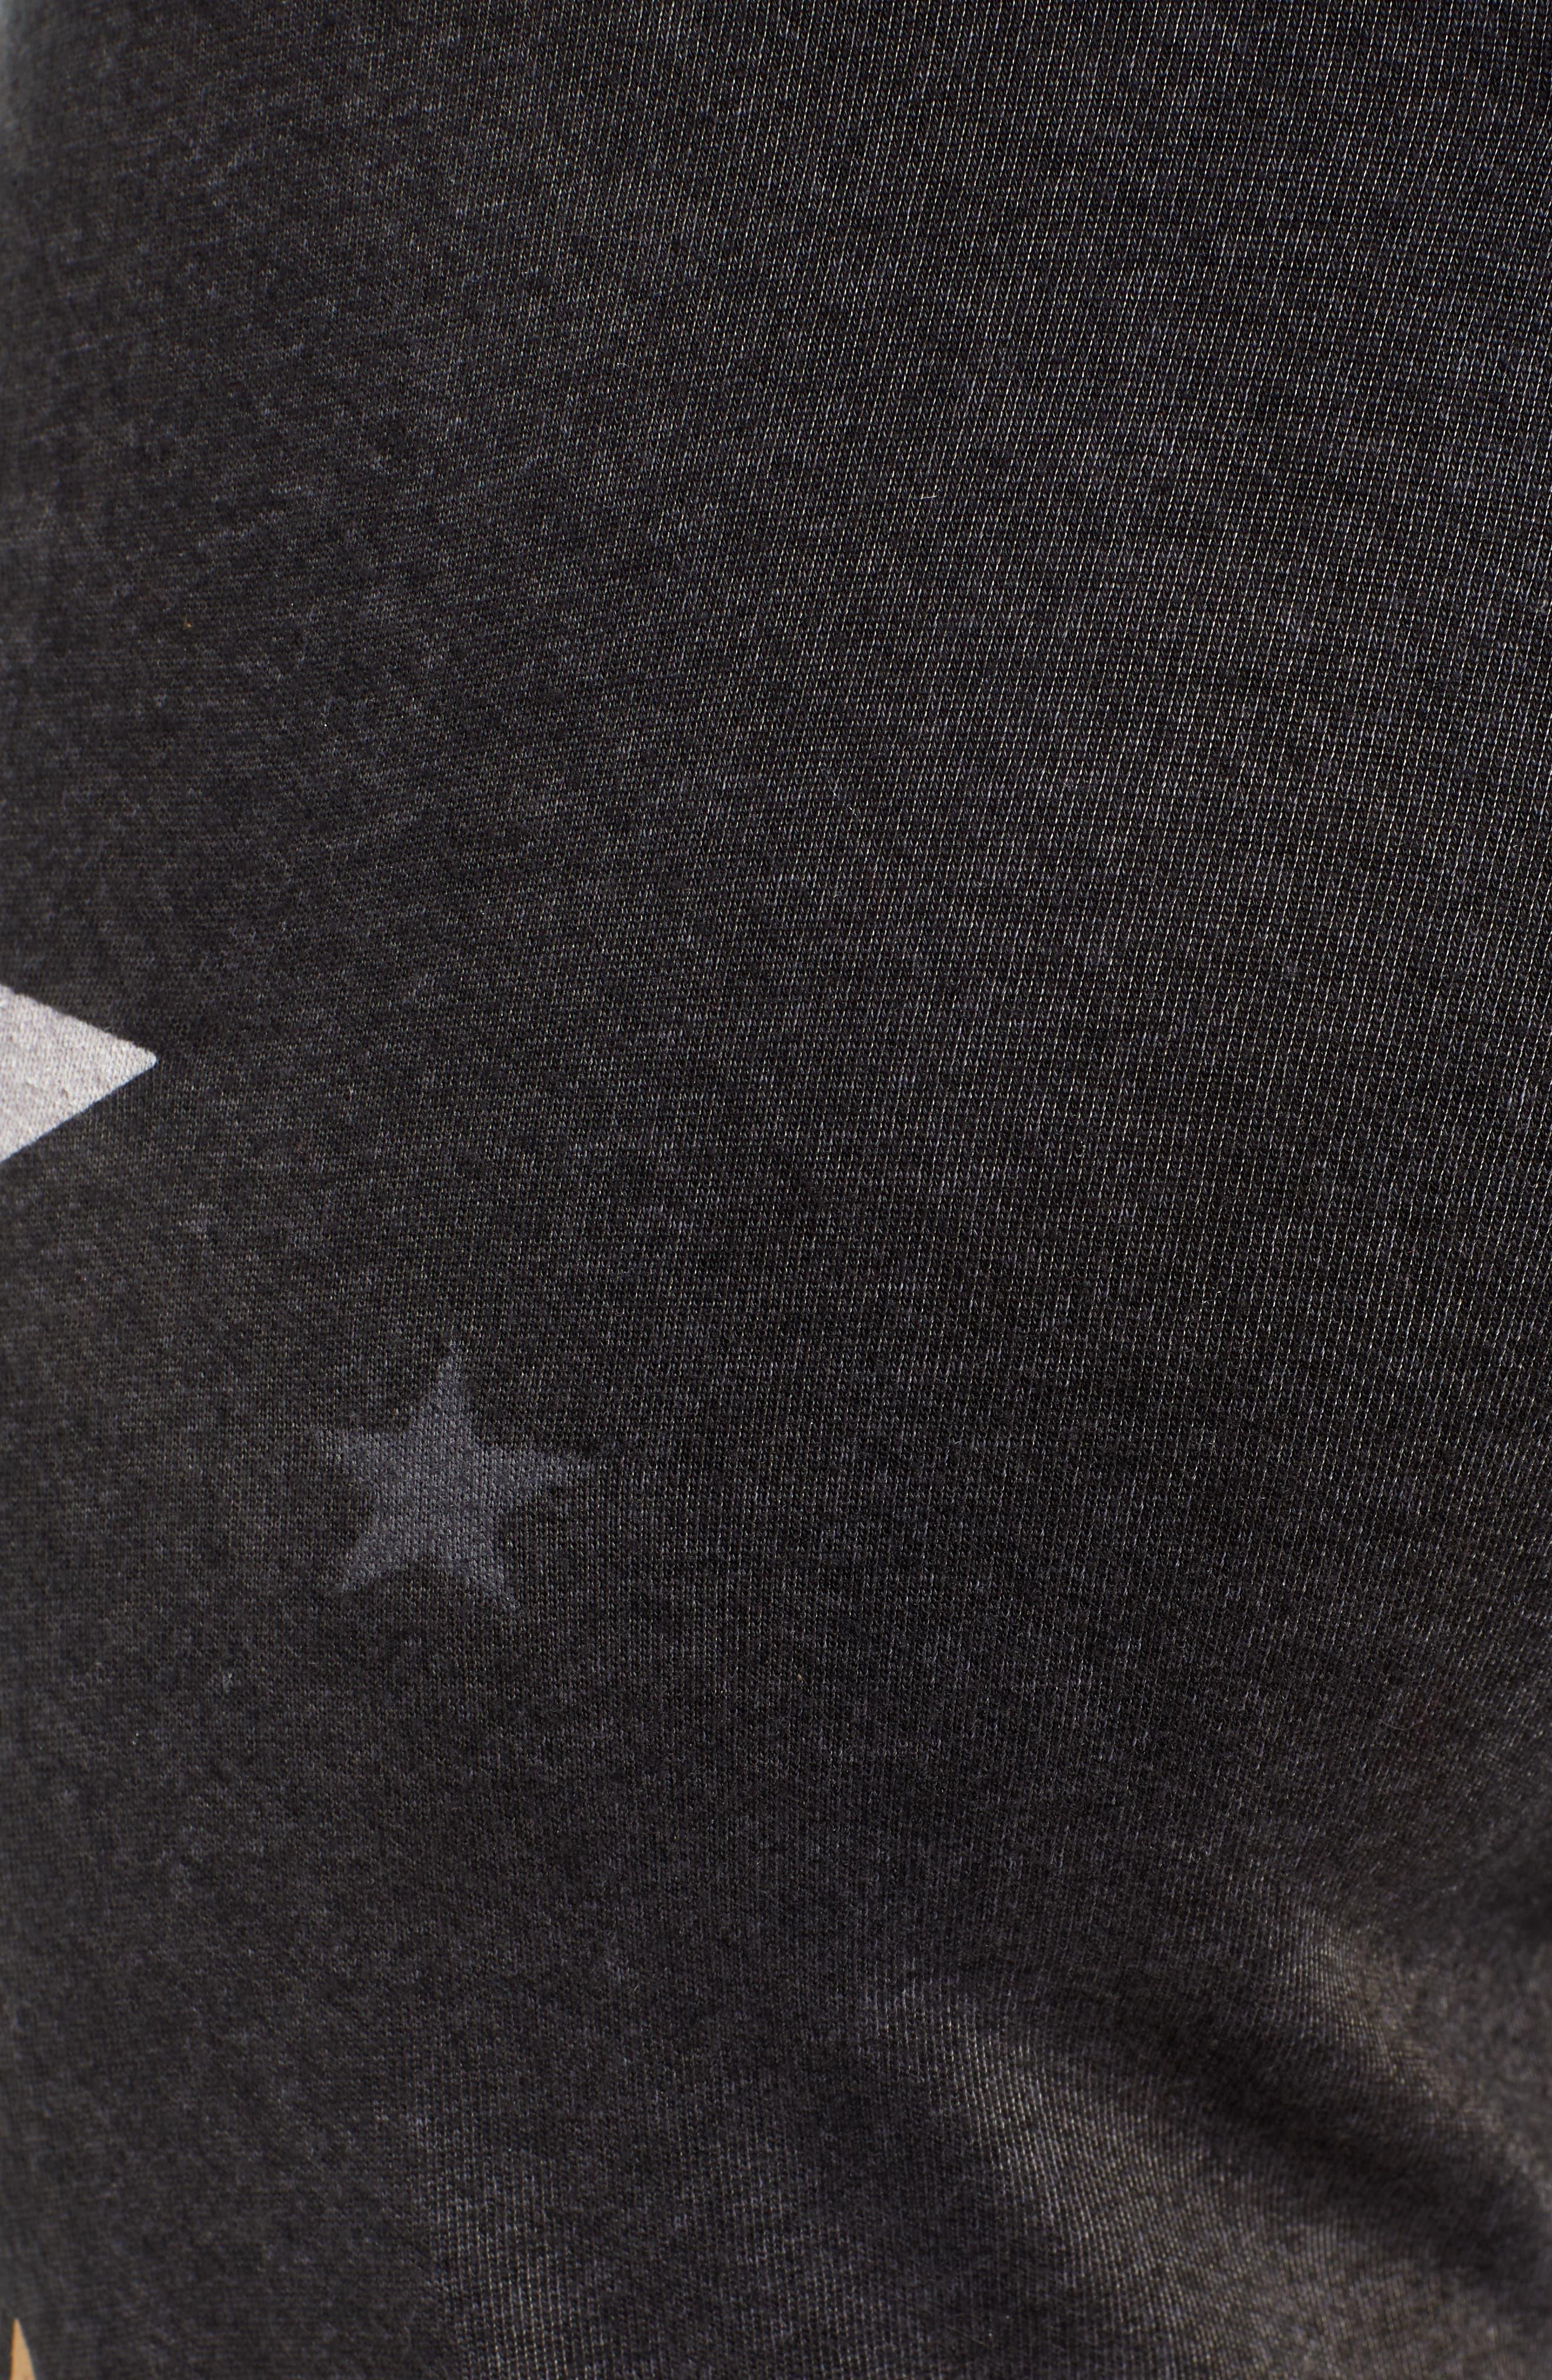 Stars Sweatpants,                             Alternate thumbnail 5, color,                             VINTAGE BLACK